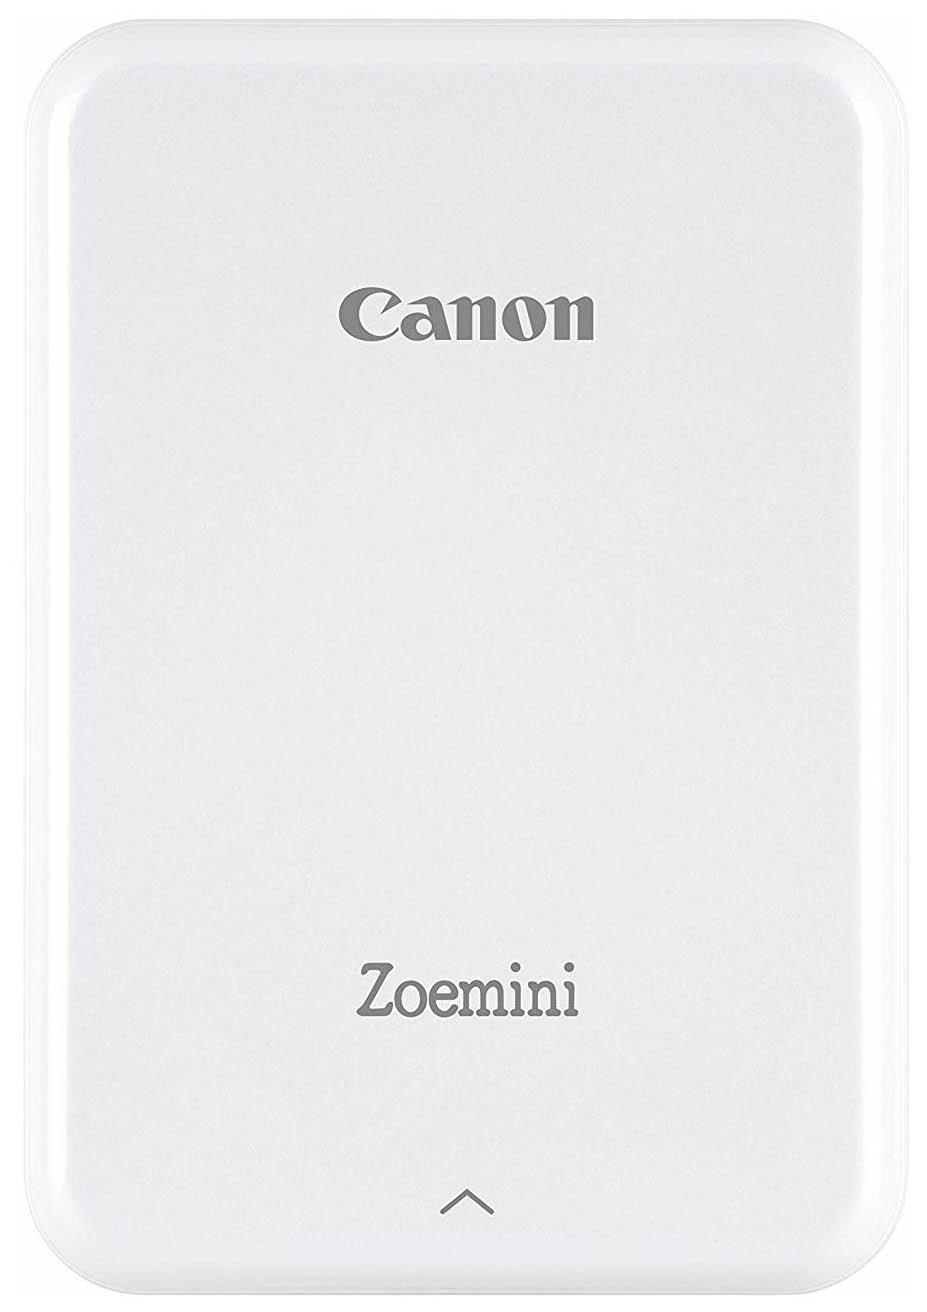 Компактный фотопринтер Canon Zoemini (PV 123 WHS)